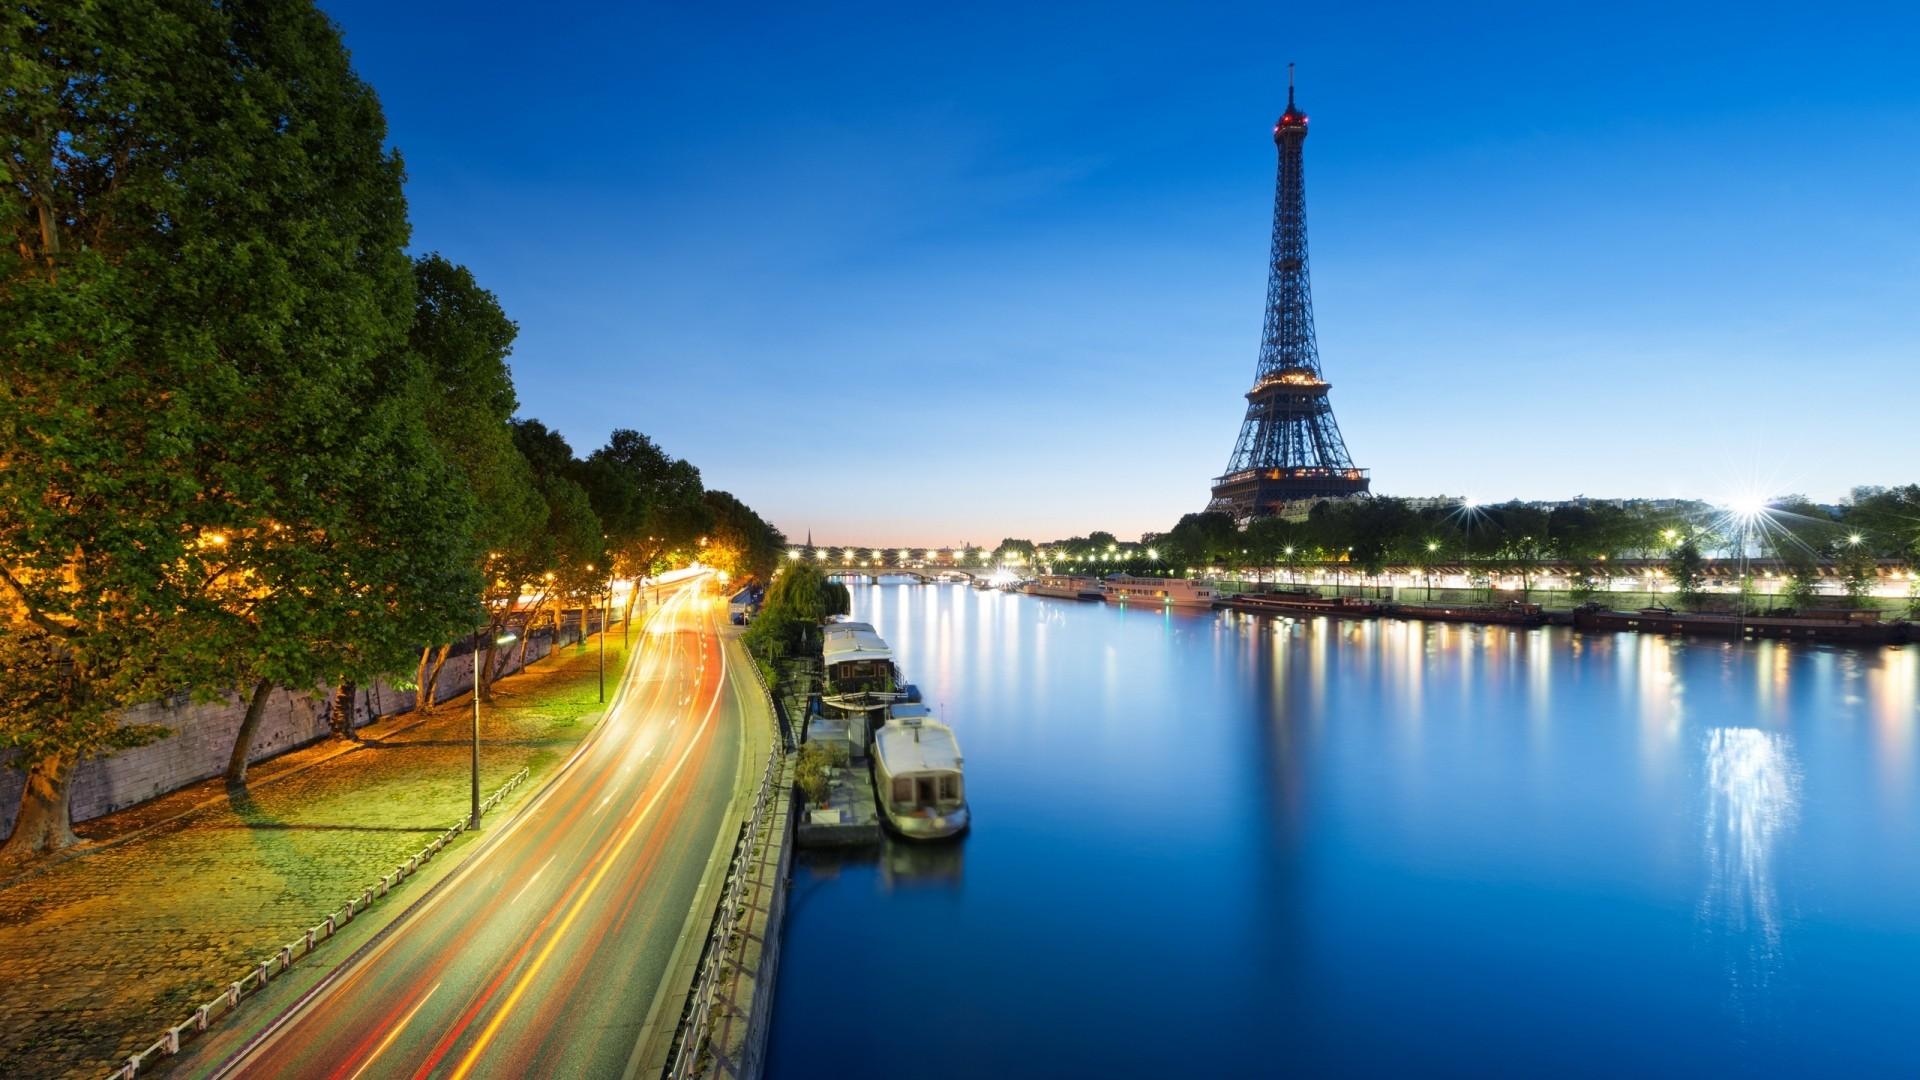 Eiffel Tower Background Wallpaper